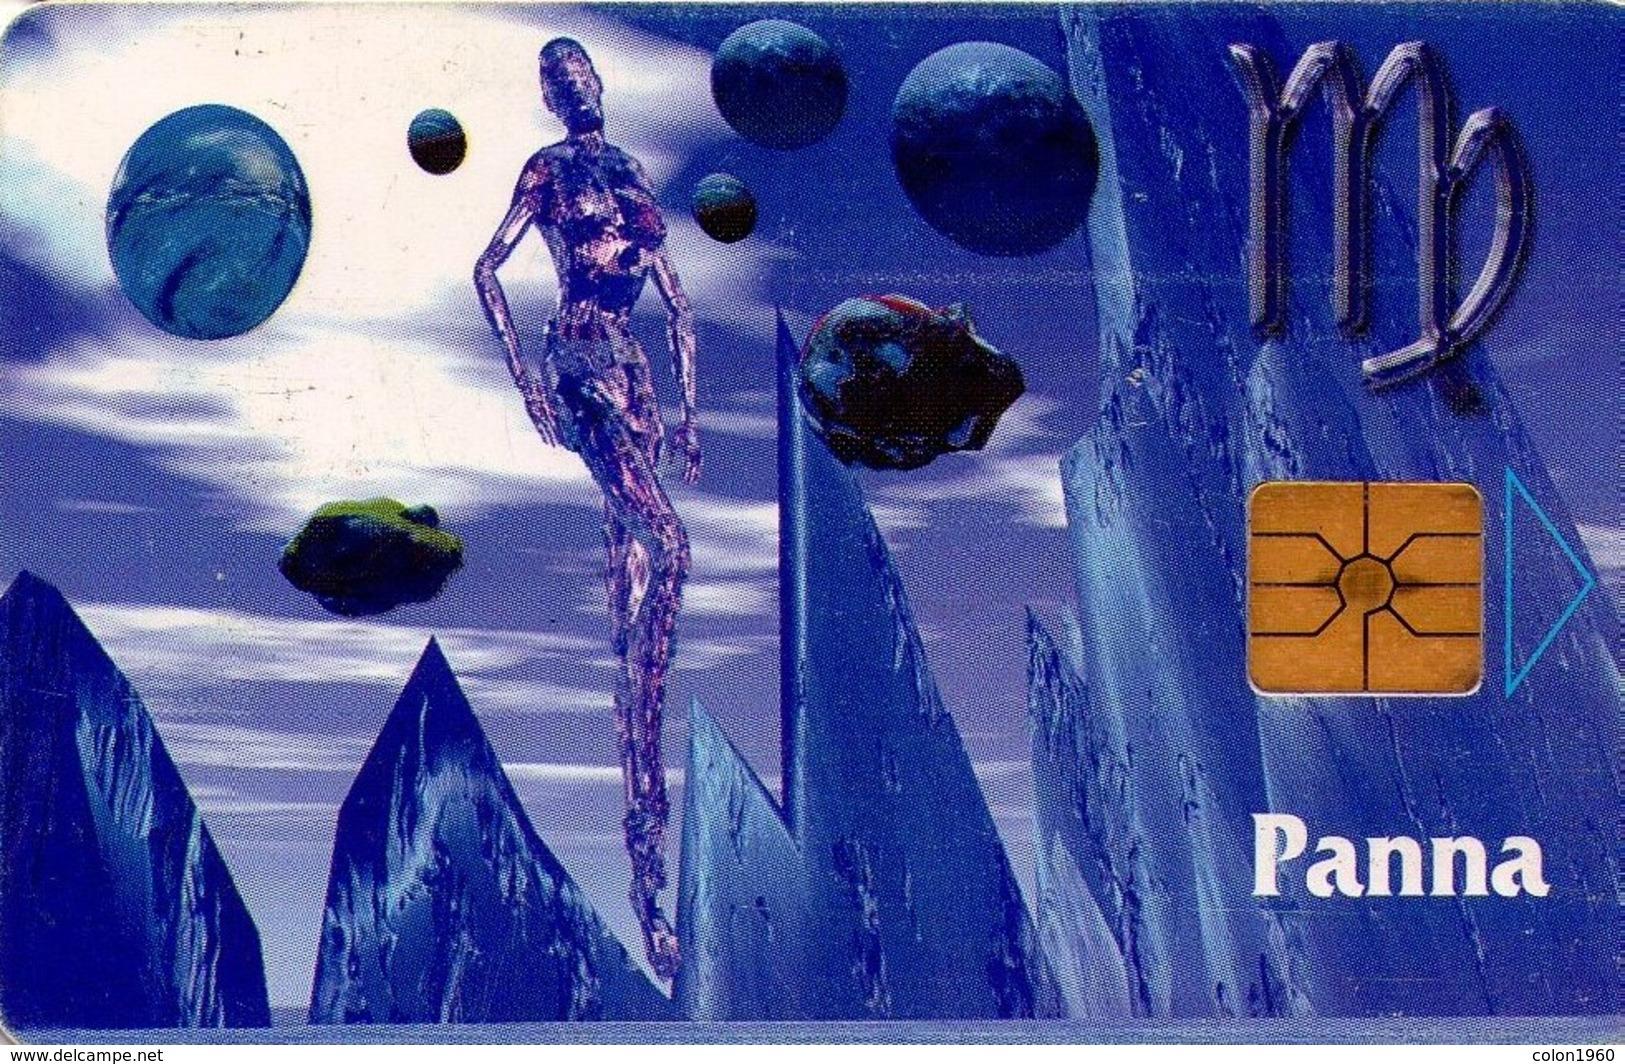 REPUBLICA CHECA. Zodiac - Panna (Virgo). C242A, 37/08.98. (020) - Sternzeichen